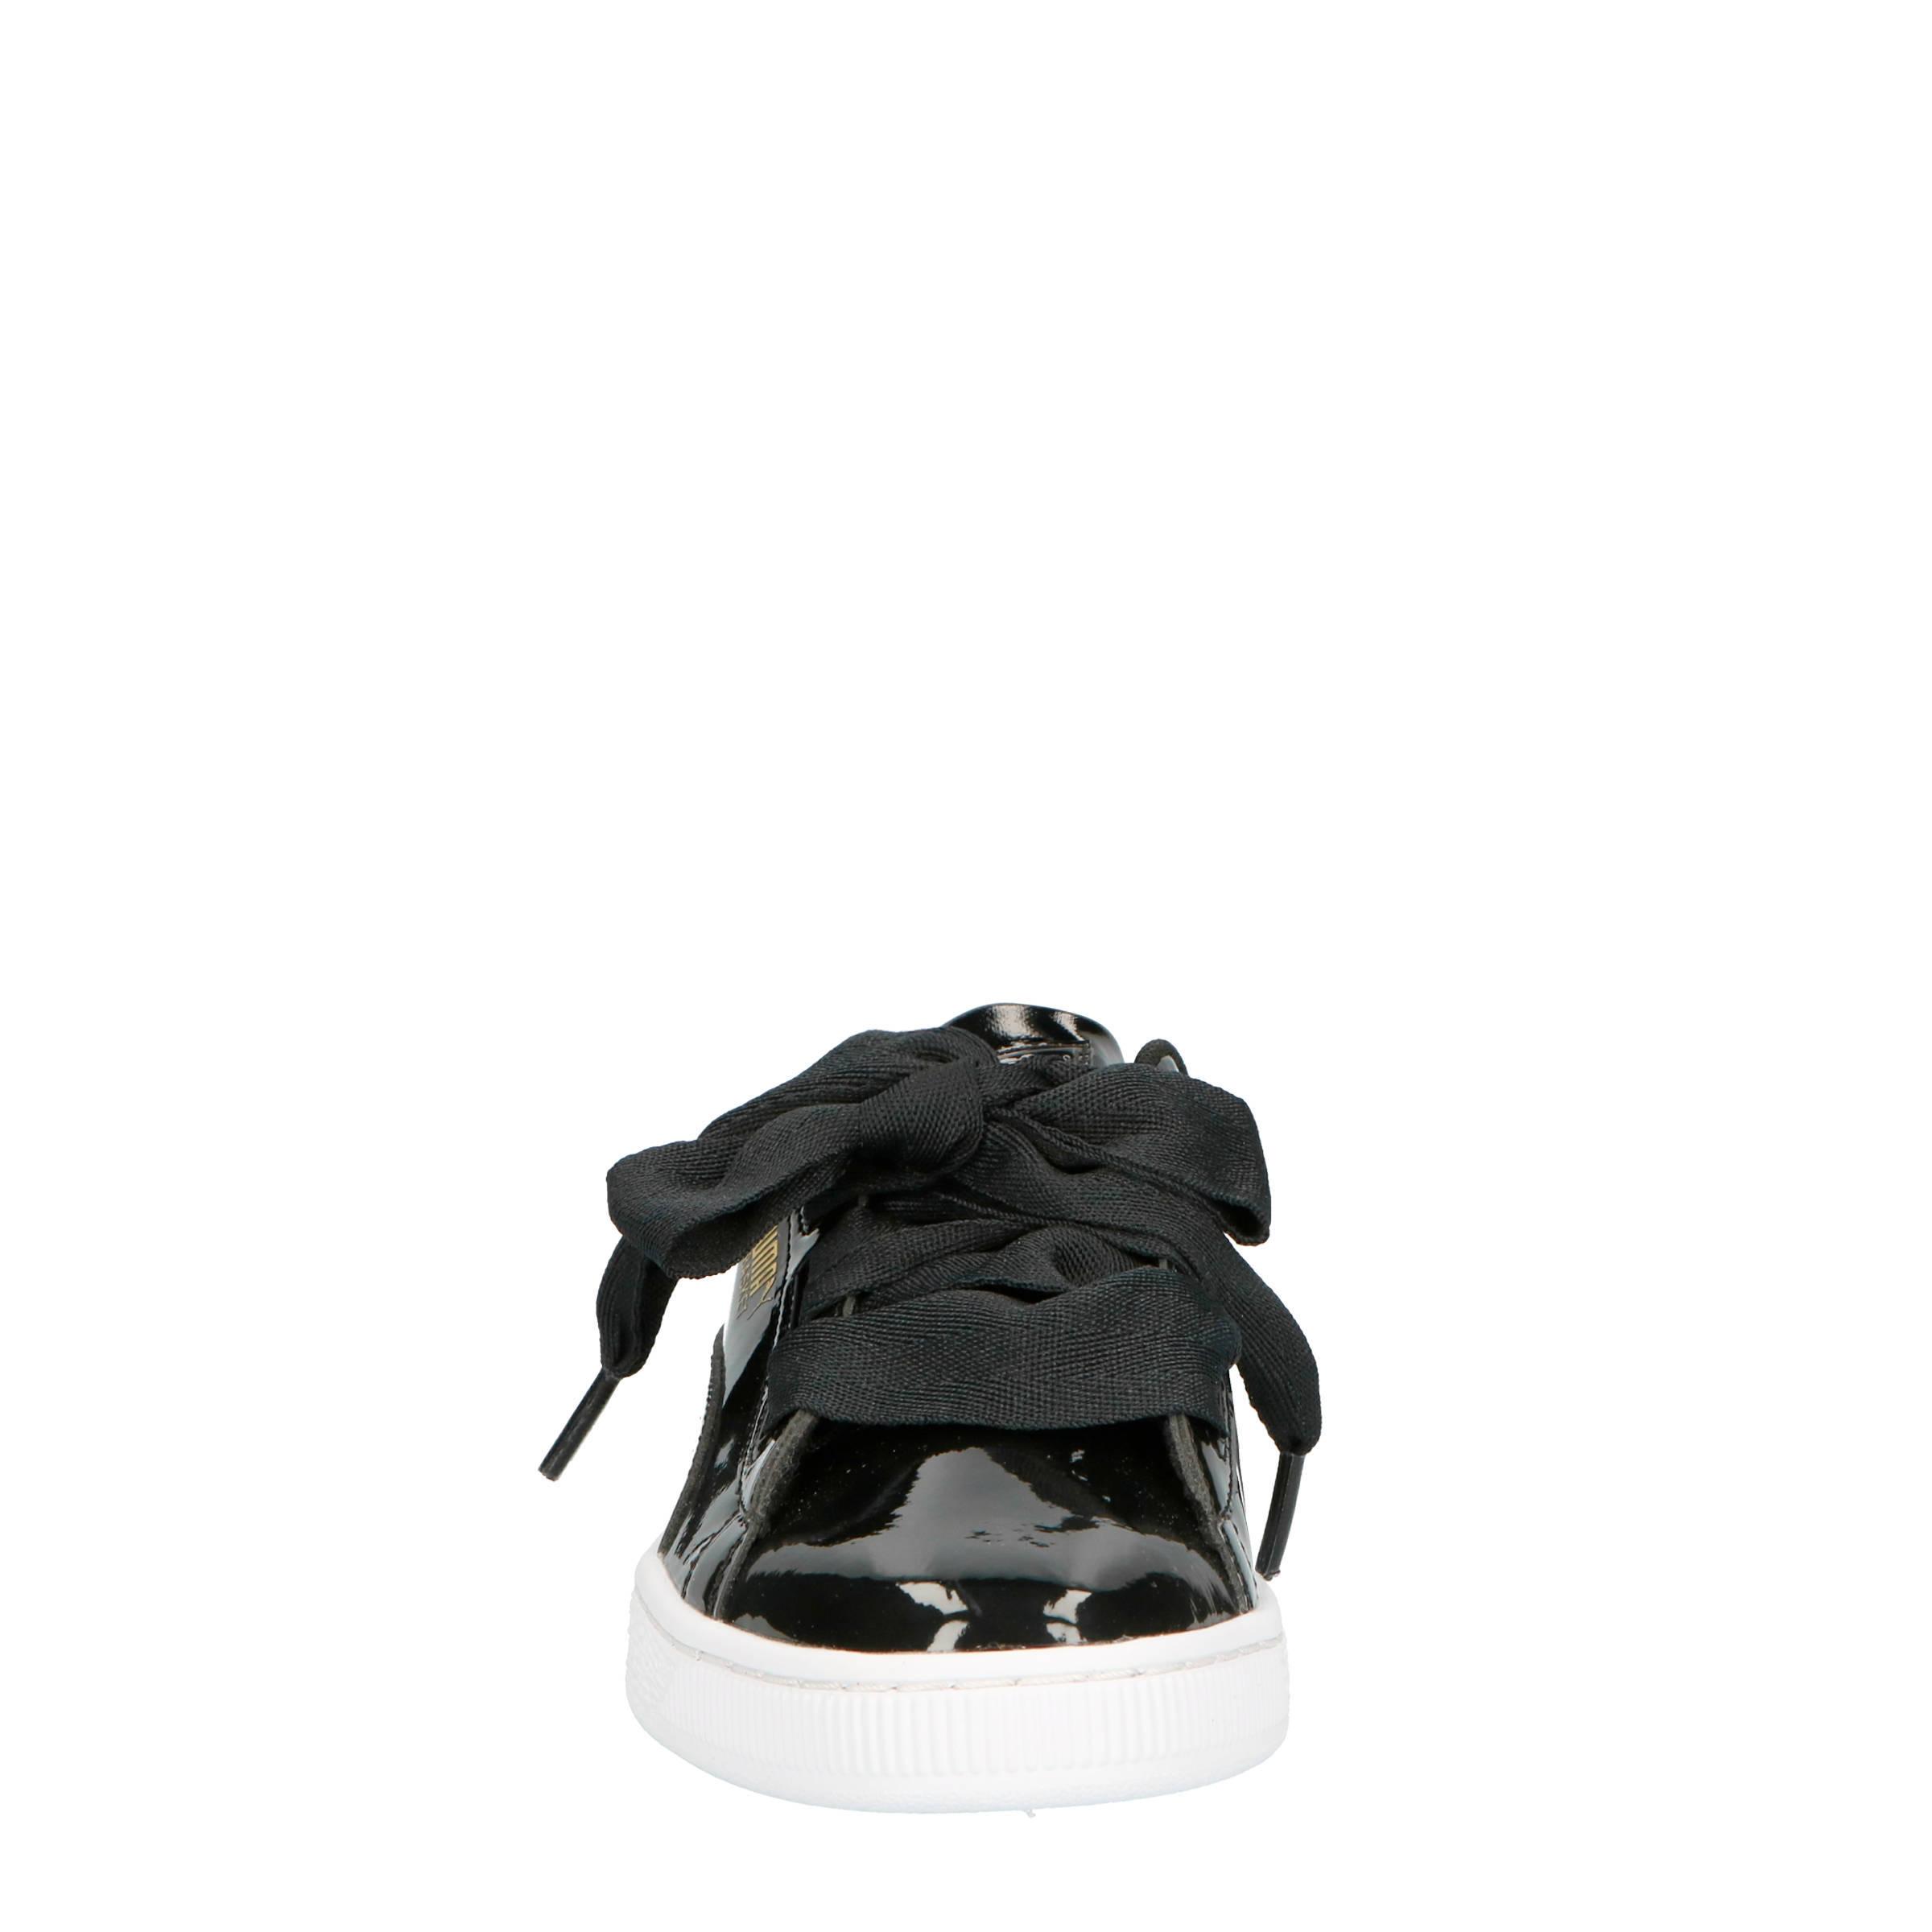 8f2fac82f46 Puma Basket Heart Patent Jr sneakers zwart | wehkamp